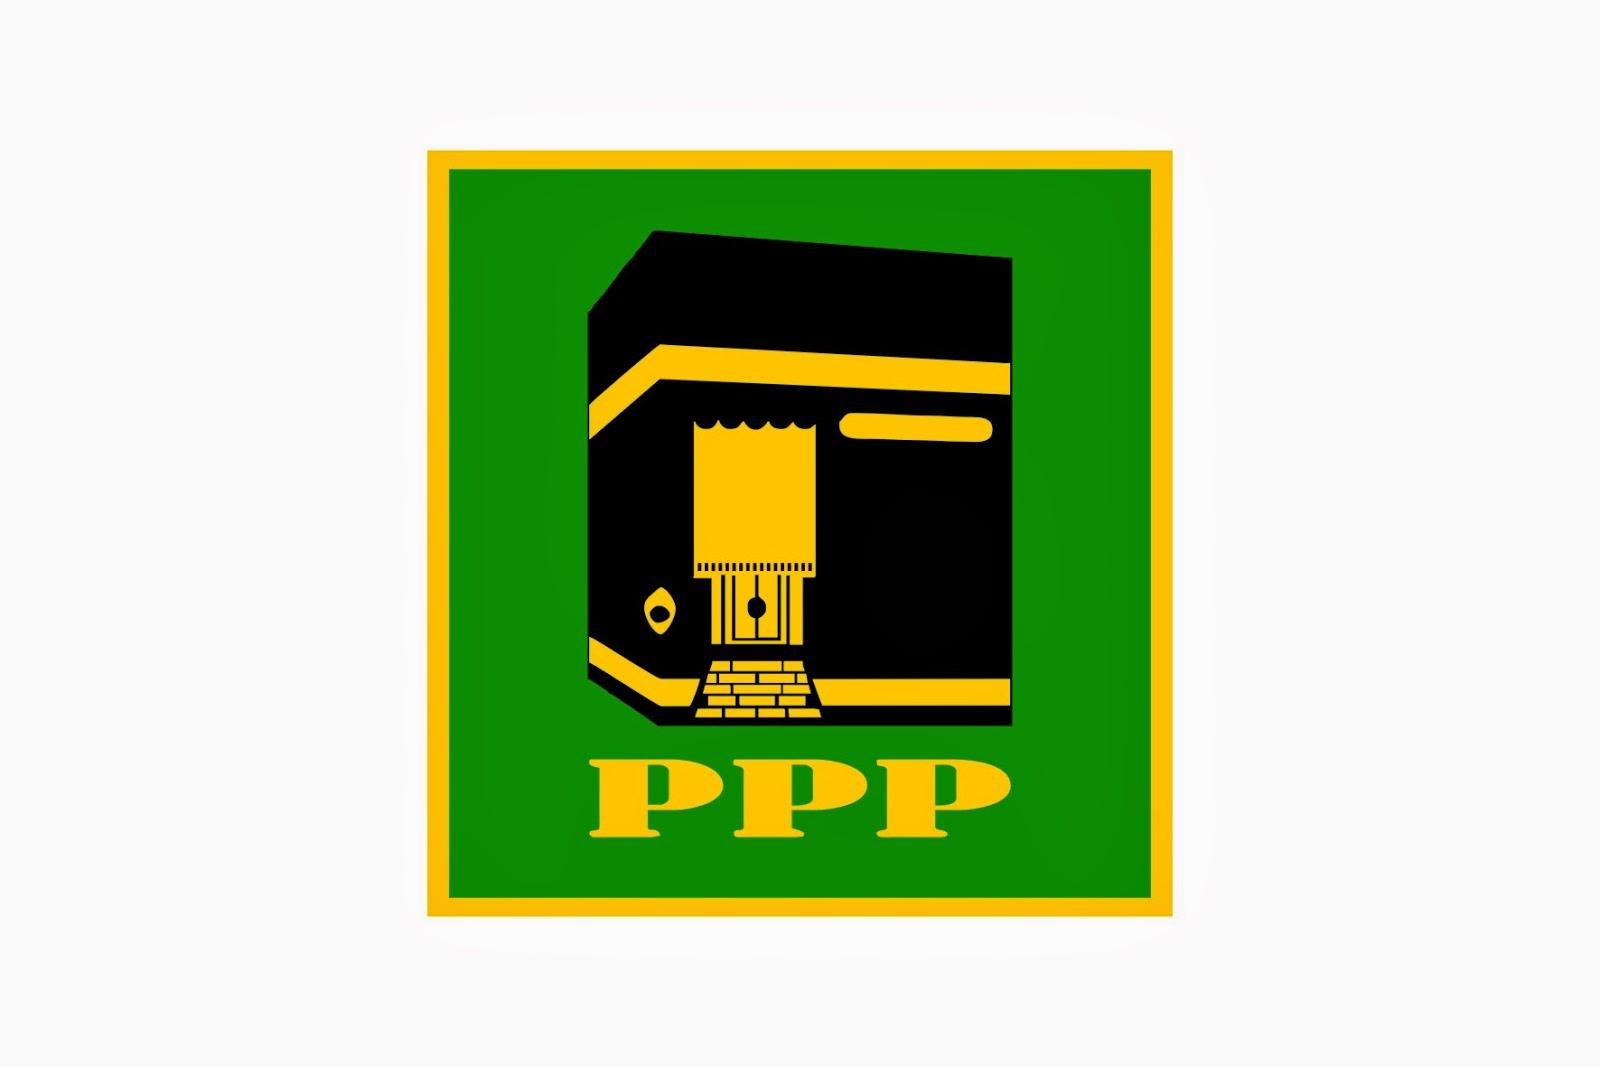 Partai Persatuan Pembangunan Logo